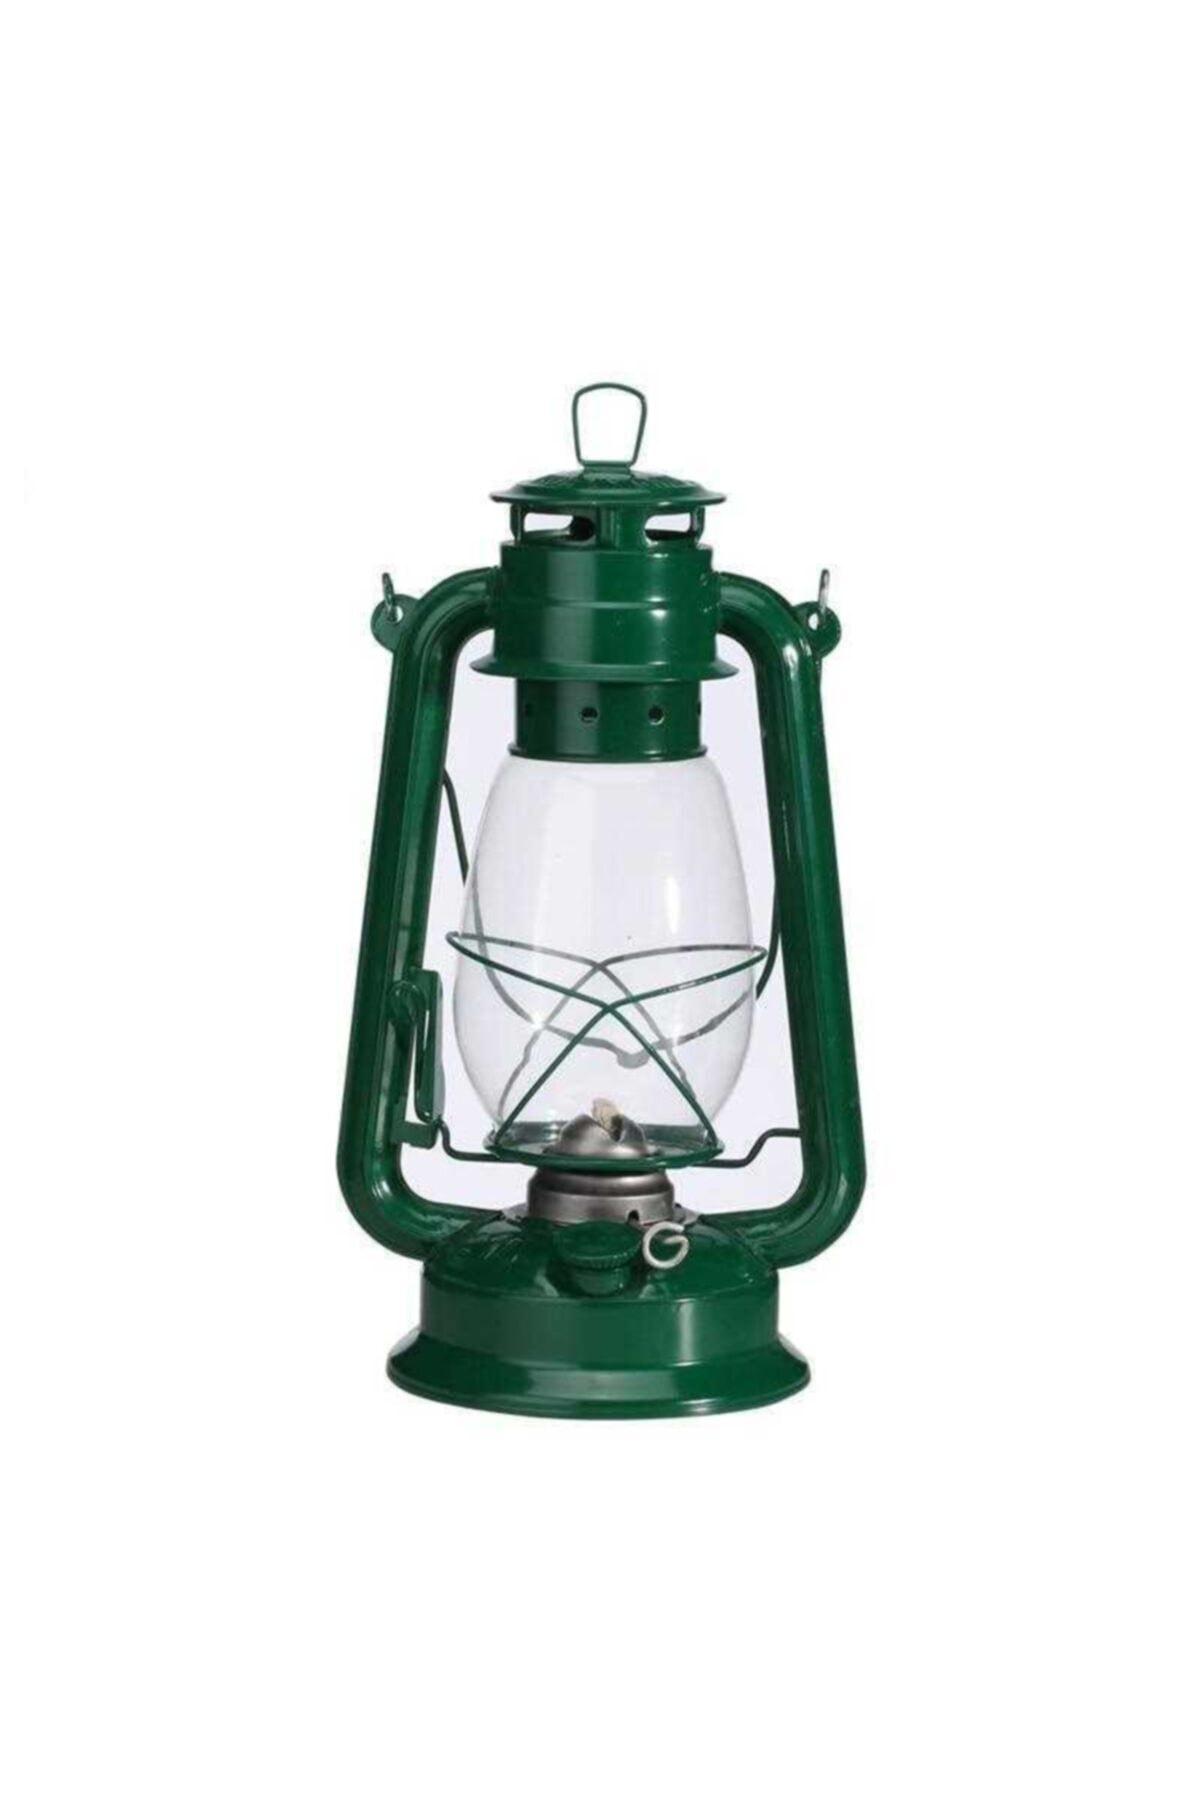 Five different color big size sailor lamp sailor flashlight decorative nostalgic retro metal glass kerosene lamp lighting light